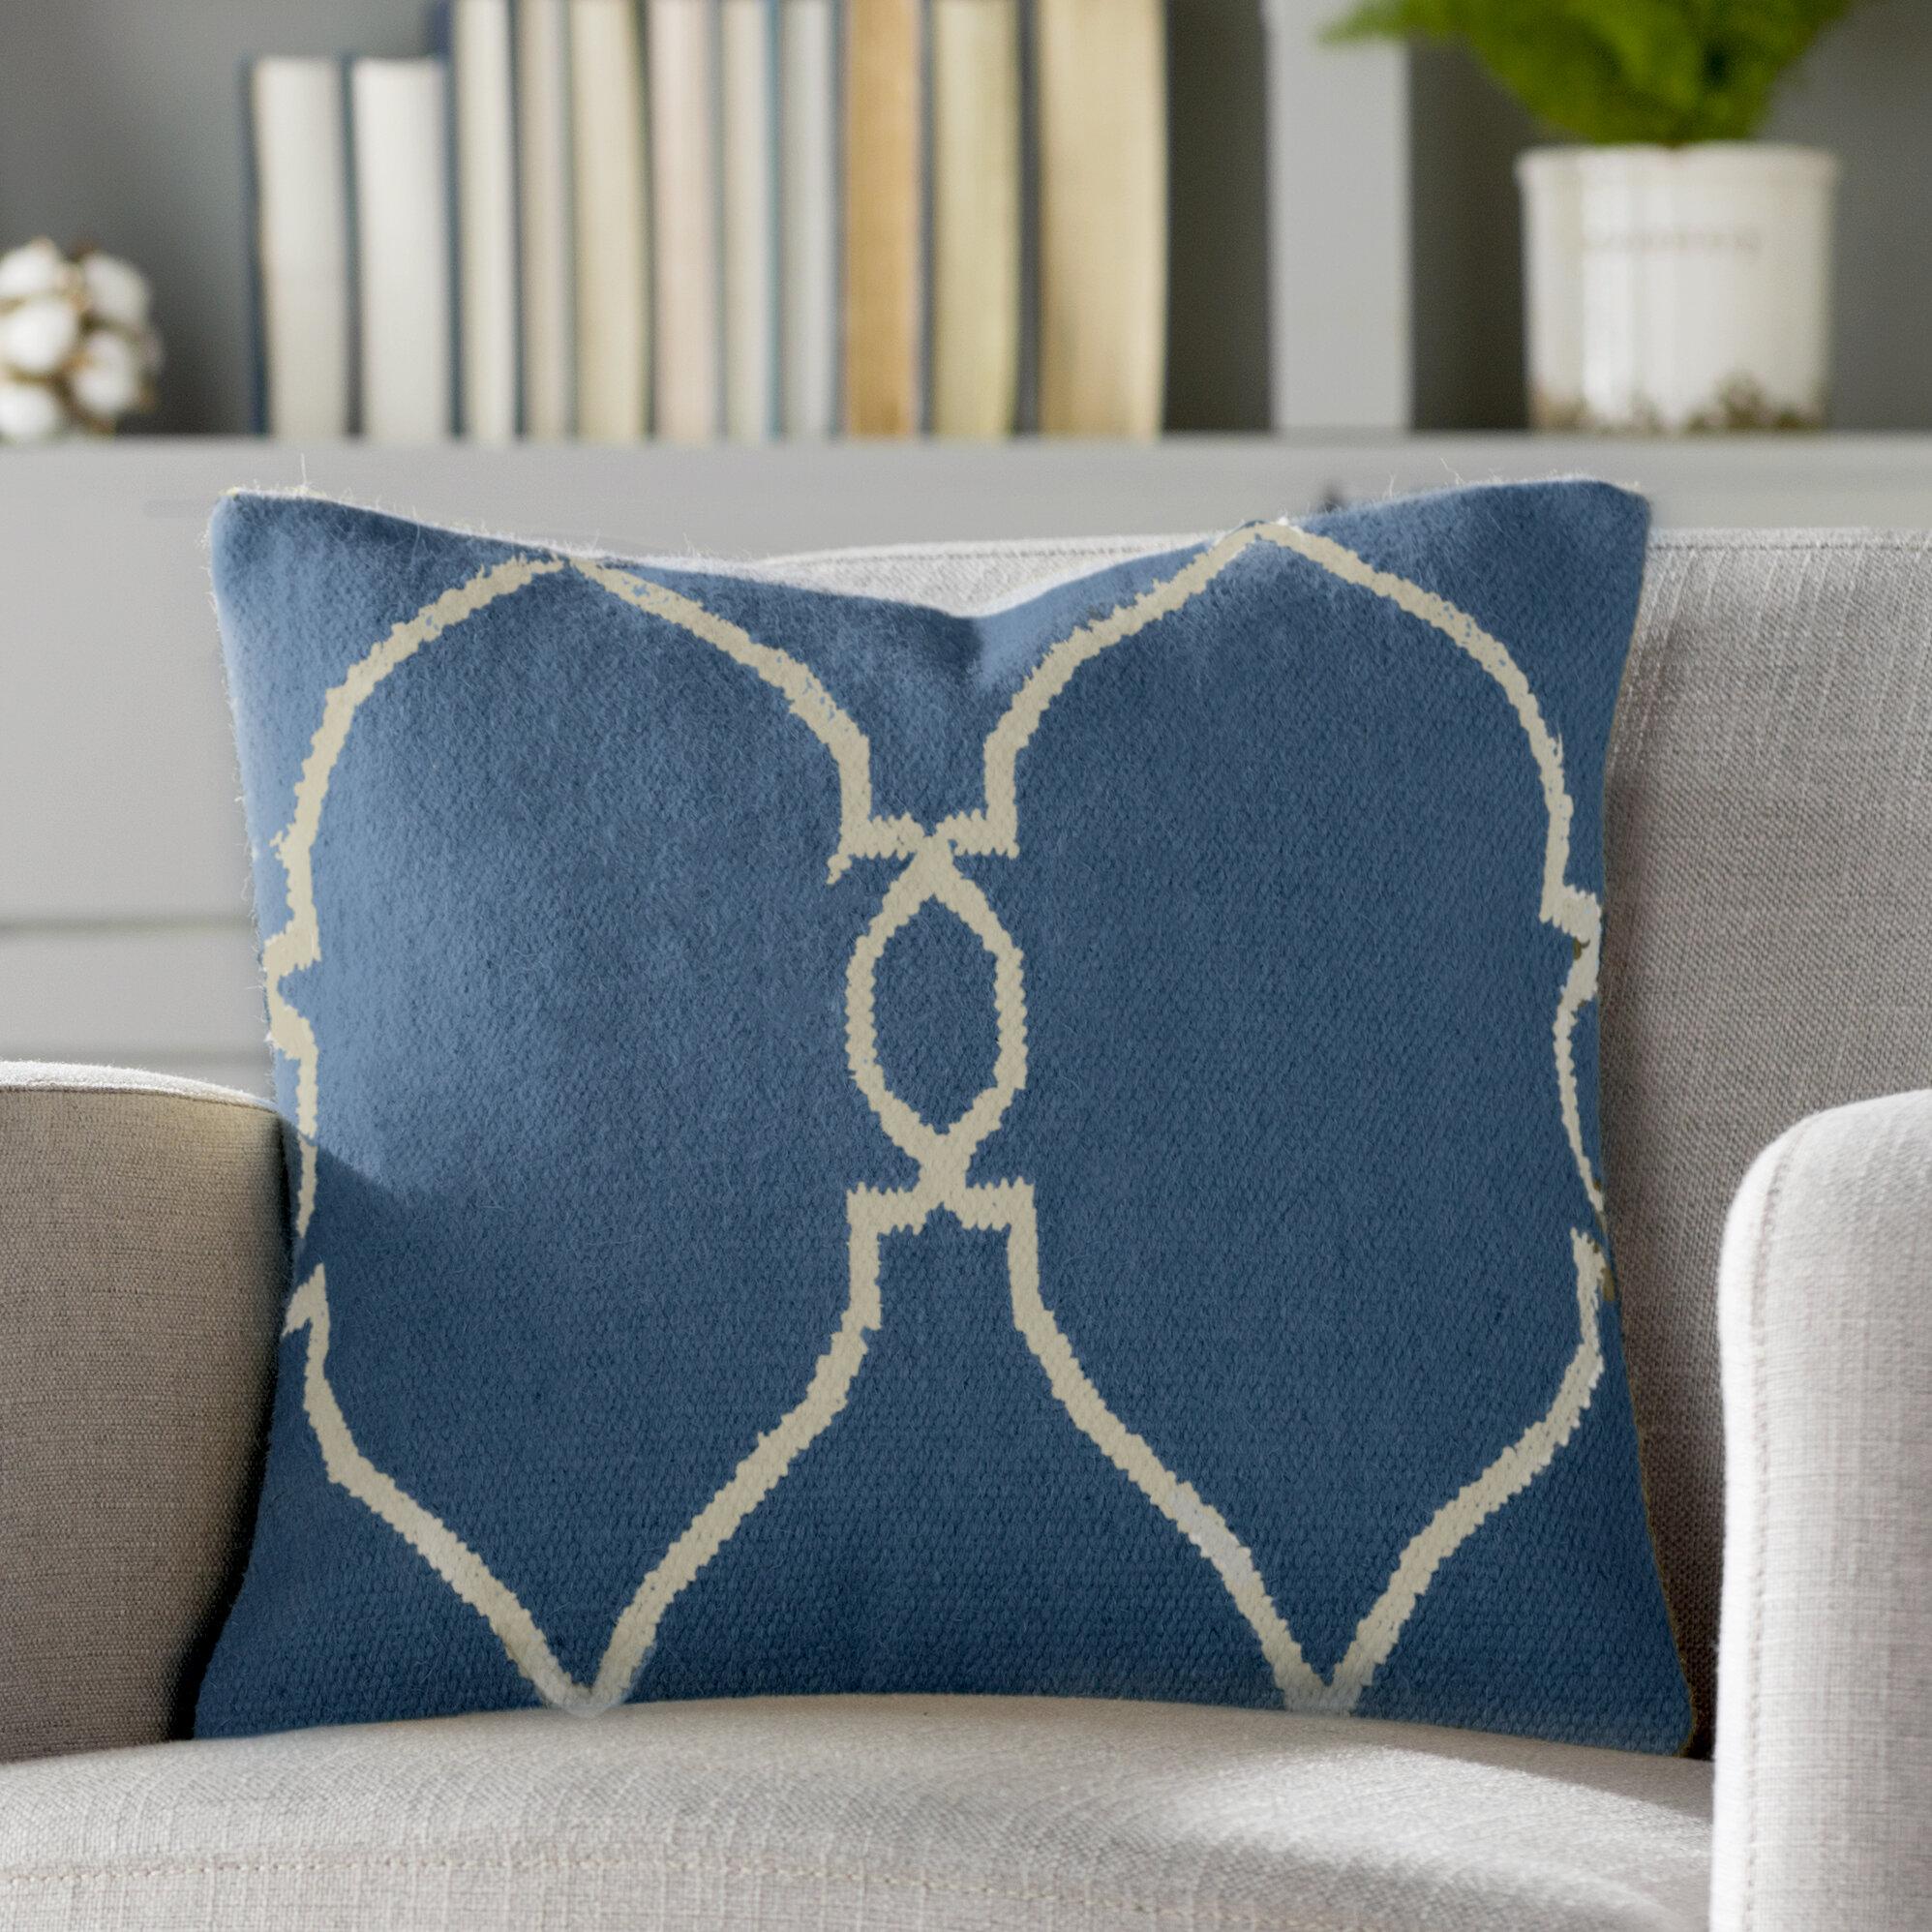 Laurel Foundry Modern Farmhouse Throw Pillows You Ll Love In 2021 Wayfair